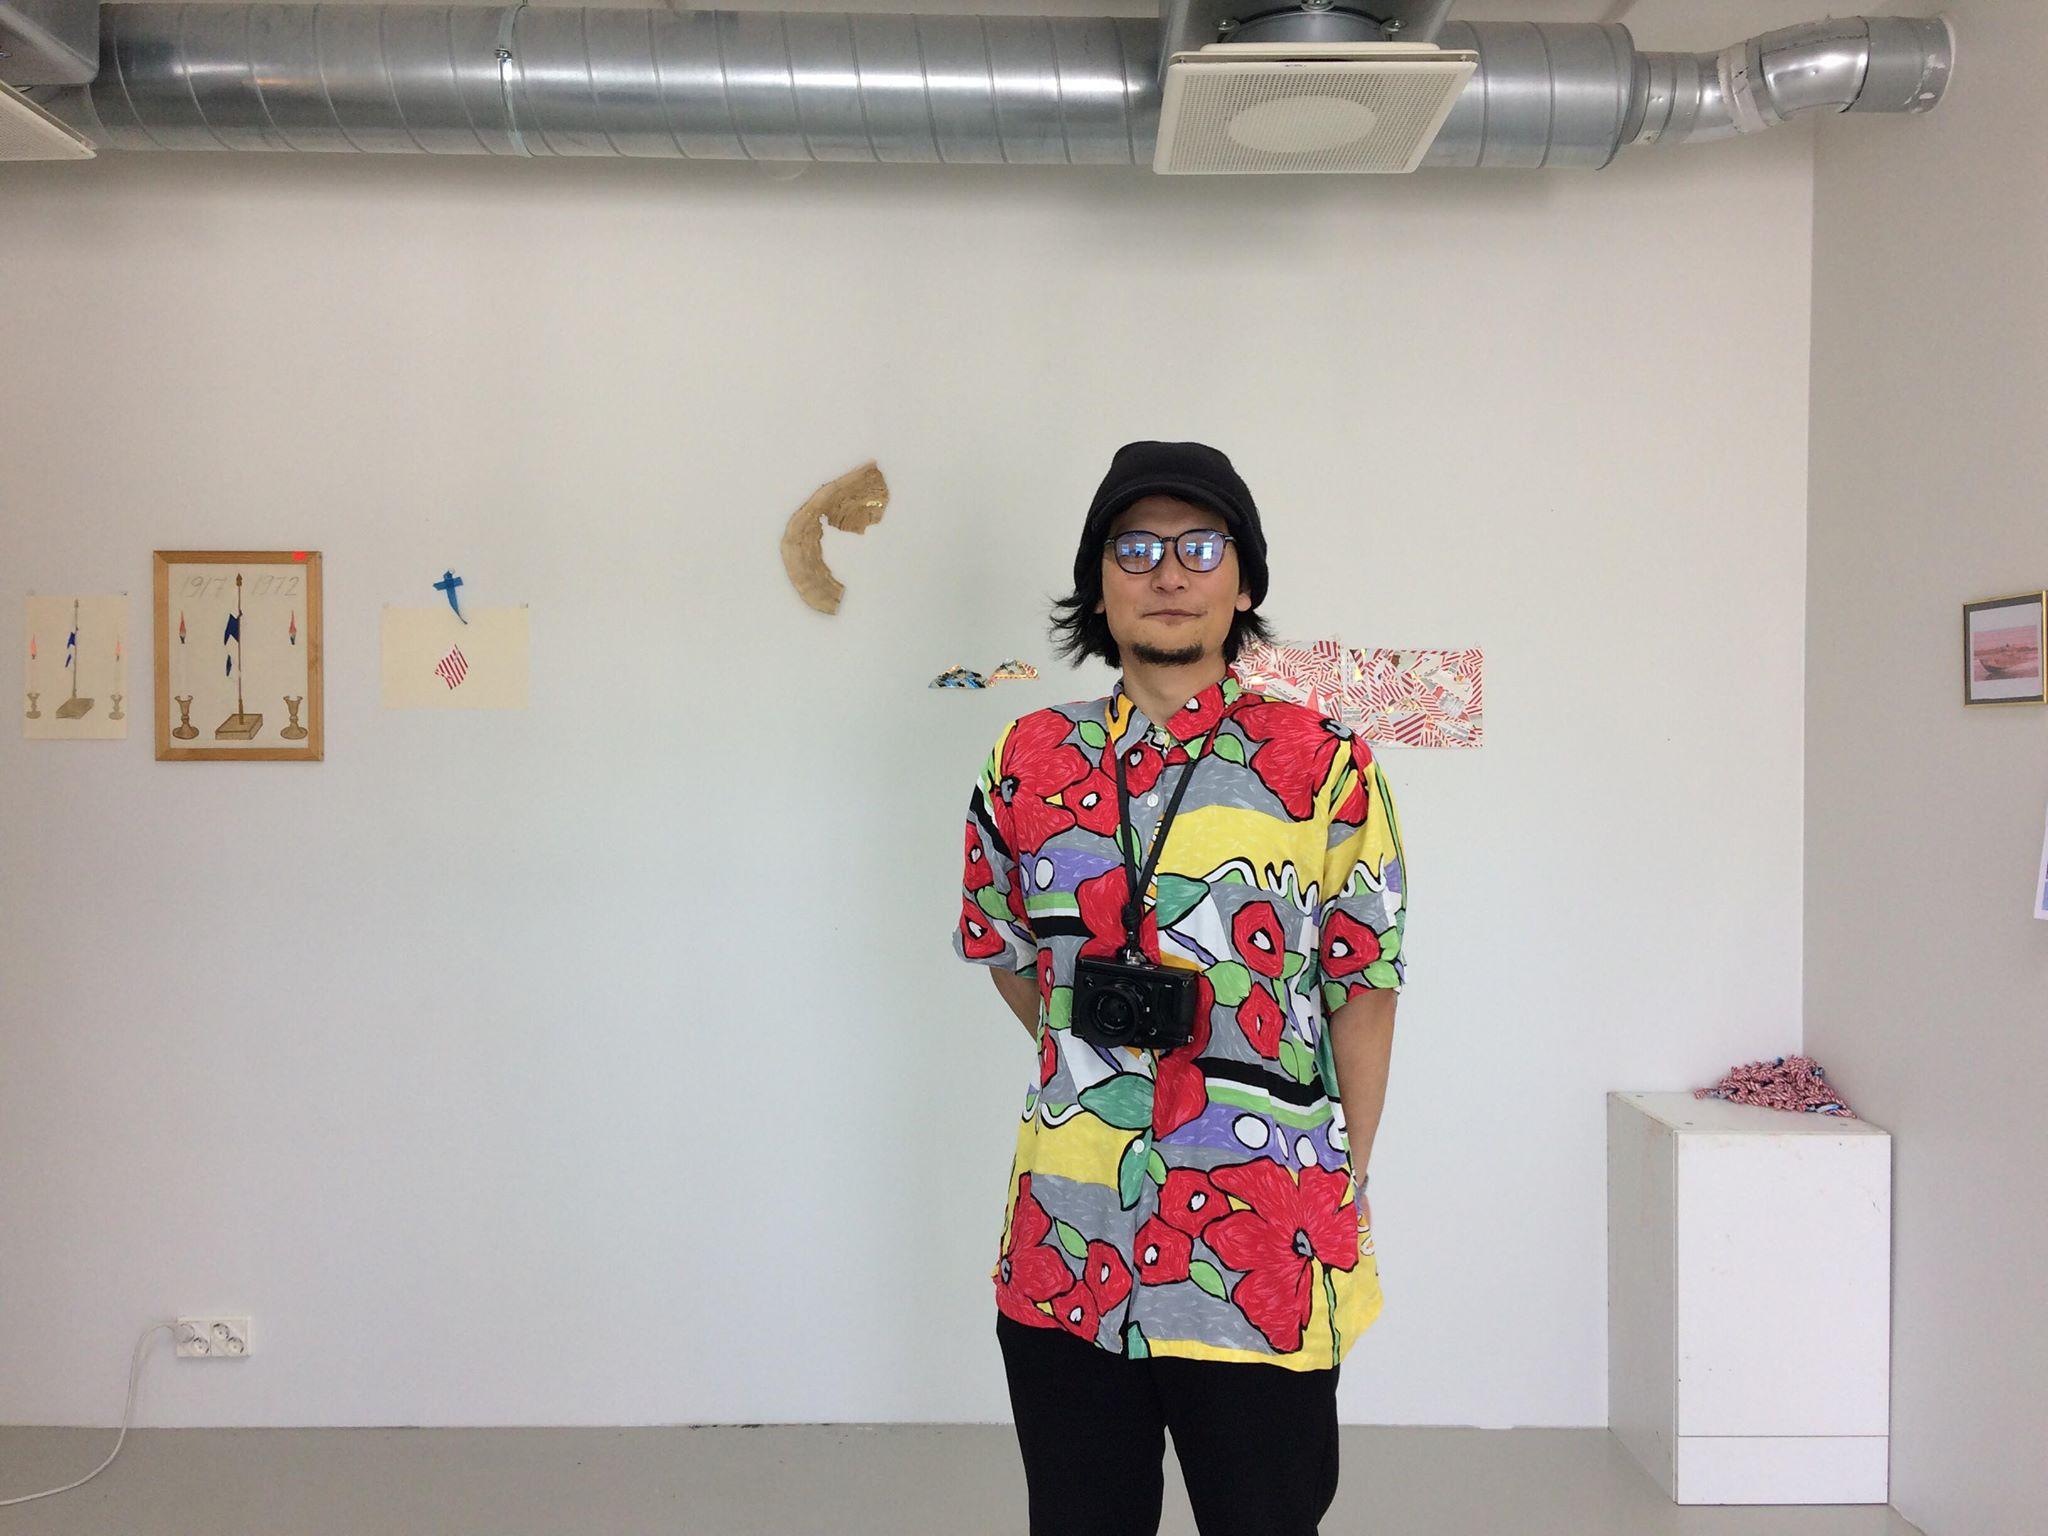 http://www.youkobo.co.jp/exhibition_events/35311955_10216724832530207_27820242637946880_n.jpg